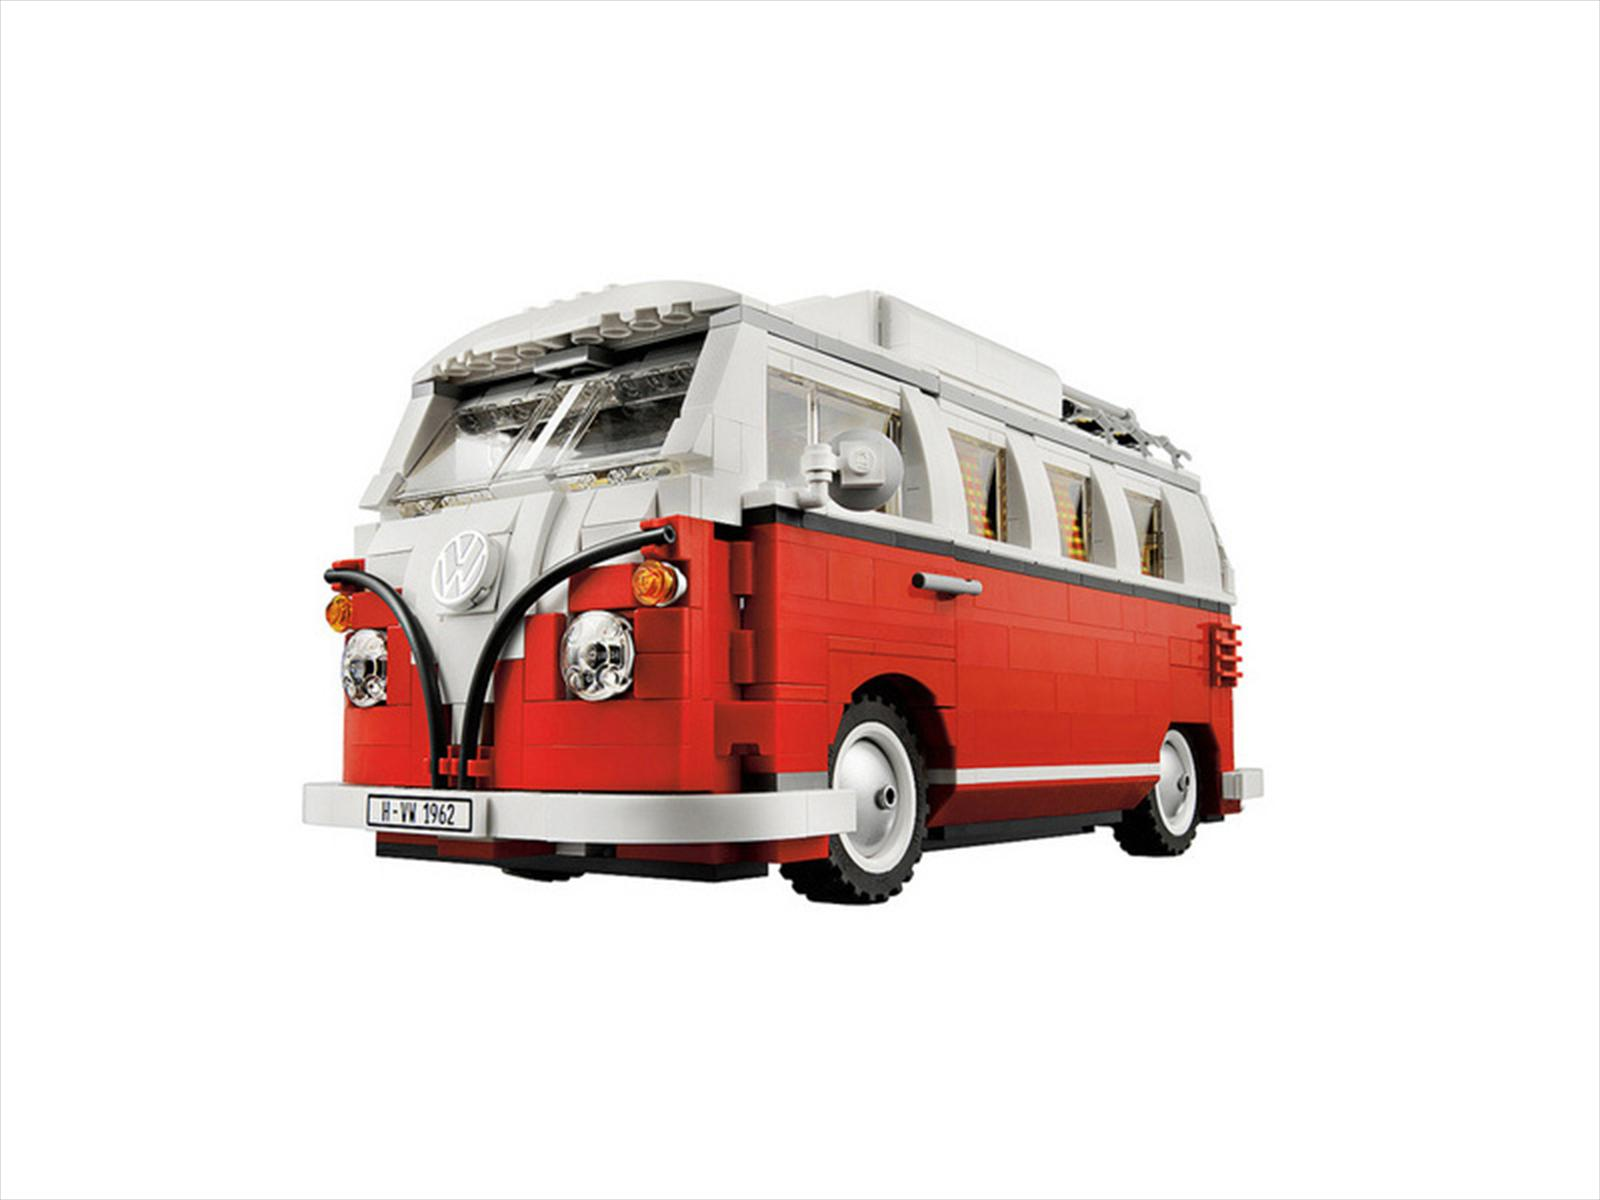 volkswagen combi 1962 de lego. Black Bedroom Furniture Sets. Home Design Ideas